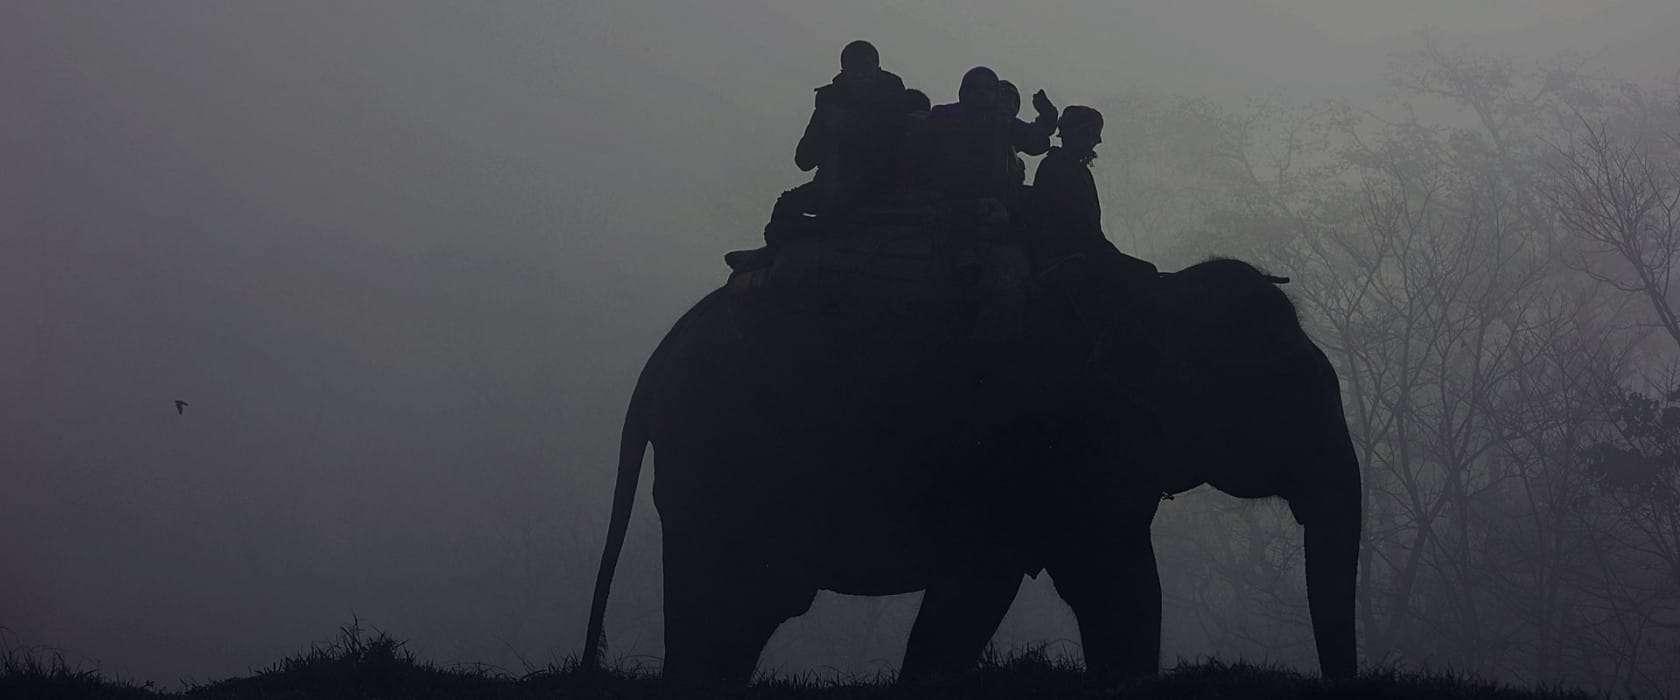 Mosaic Adventure no longer offers Elephant Riding tours